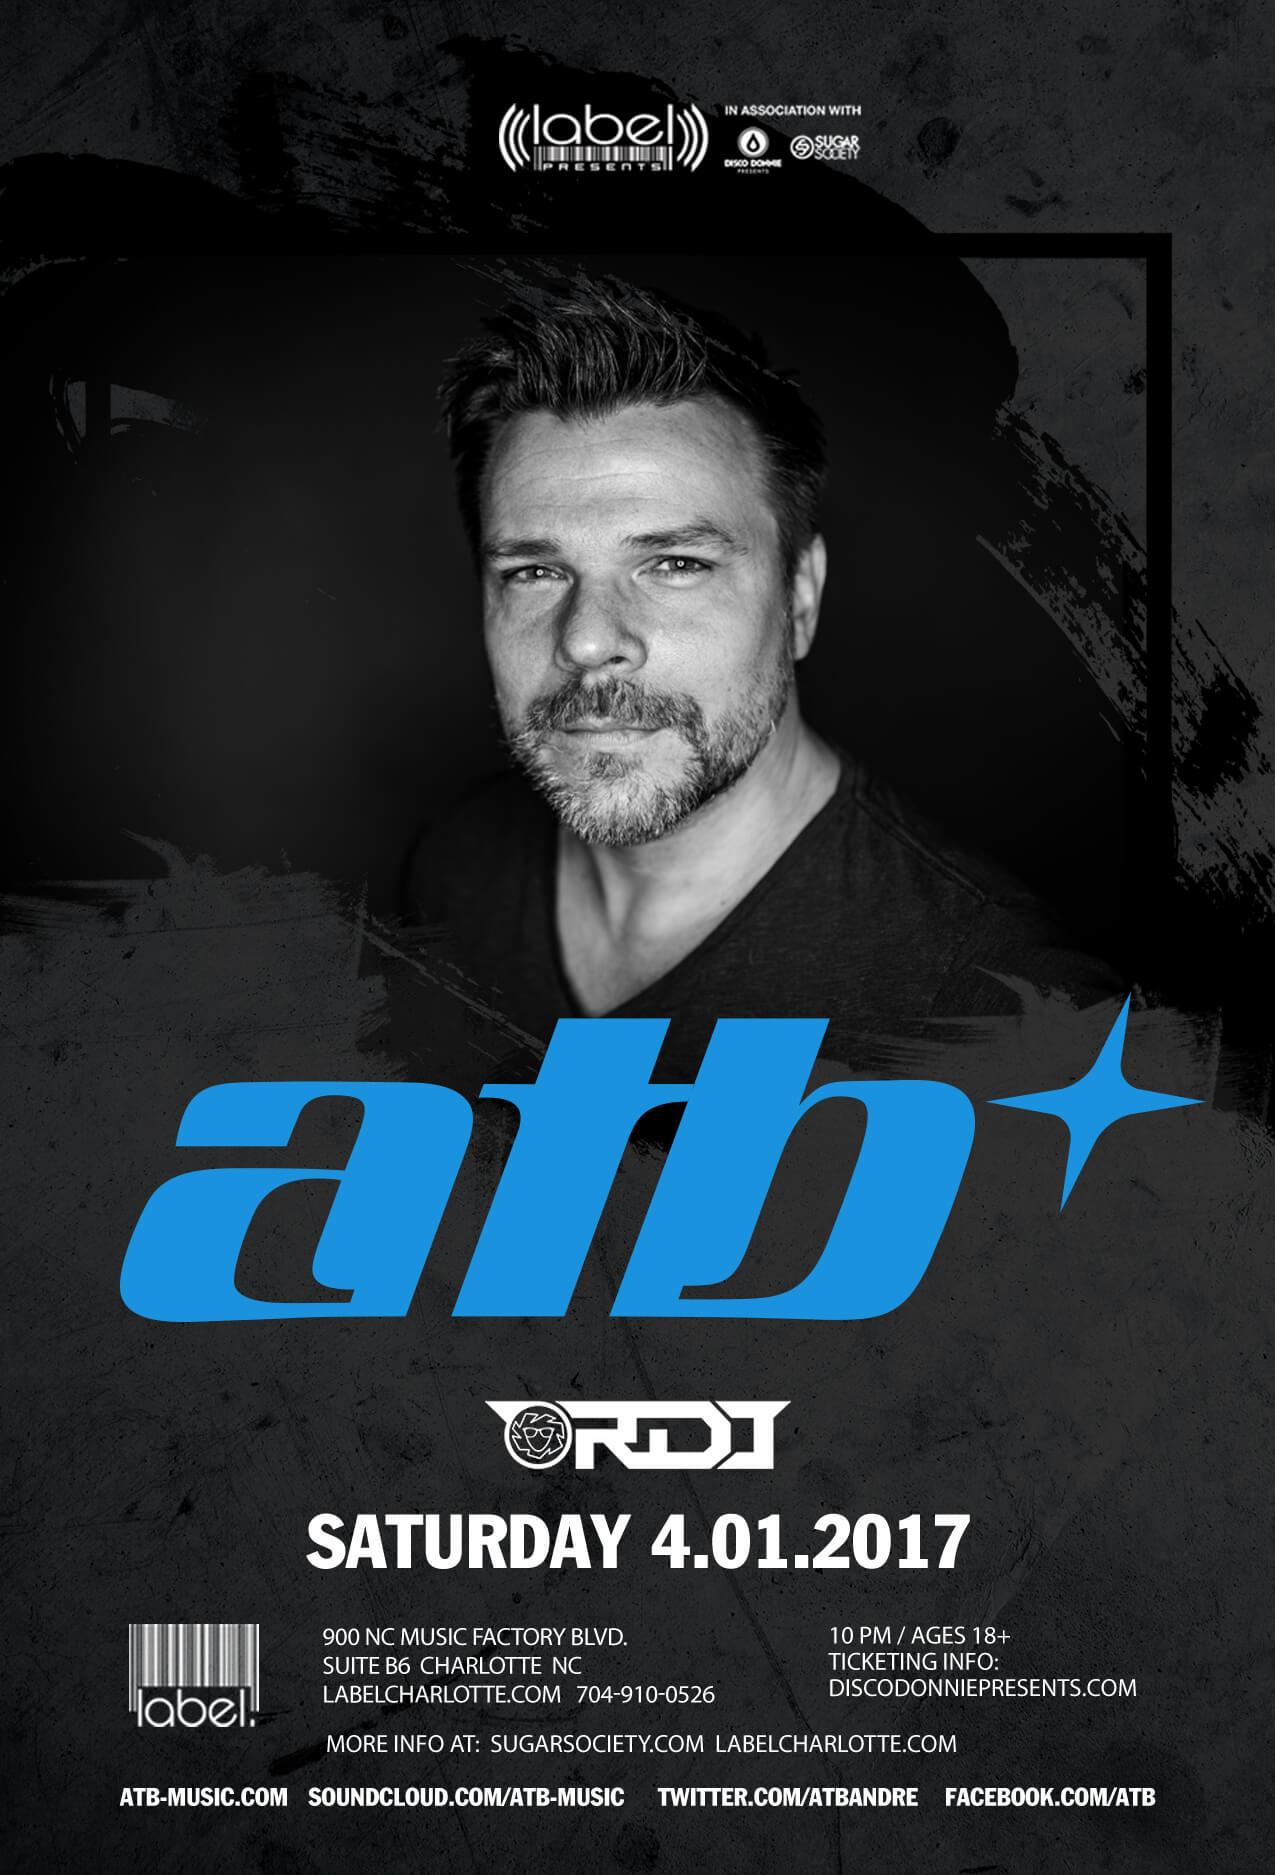 ATB, RDJ in Charlotte